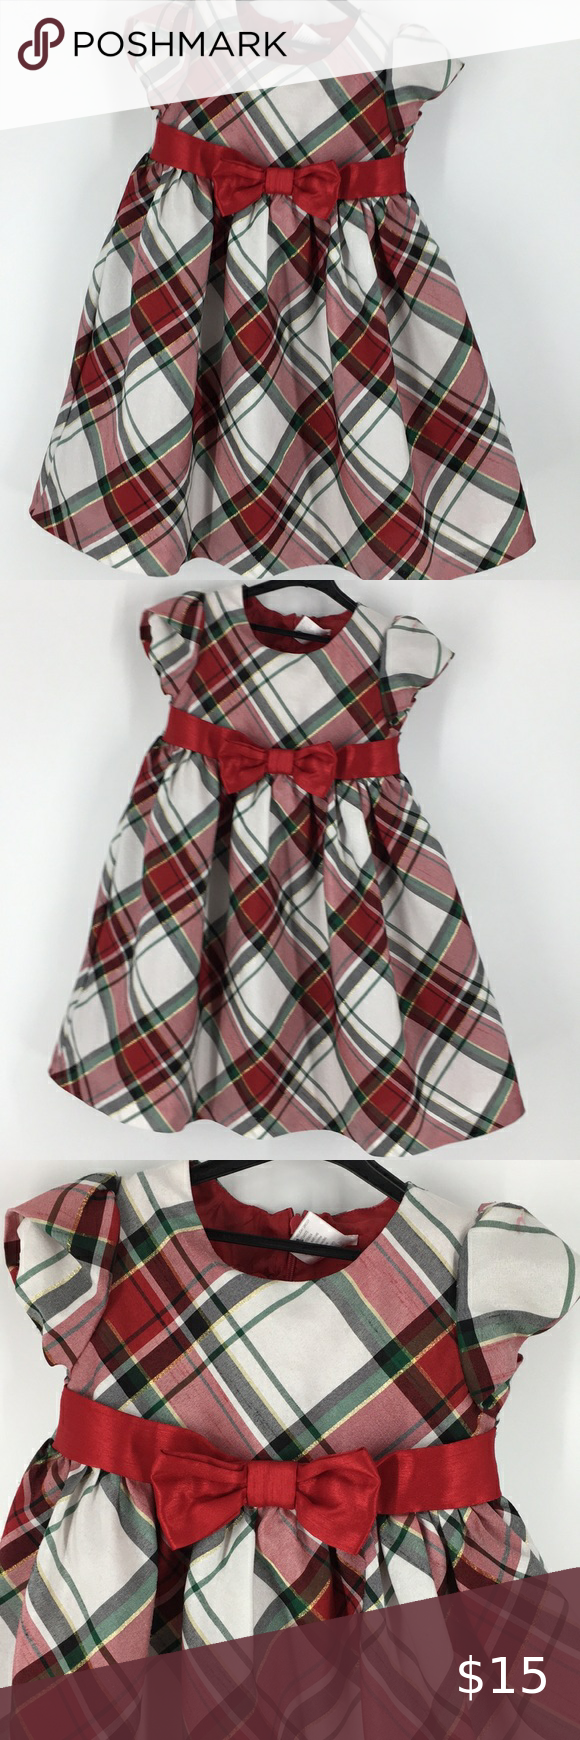 Gymboree Red Green Plaid Dress K2005 Green Plaid Dress Plaid Dress Clothes Design [ 1740 x 580 Pixel ]